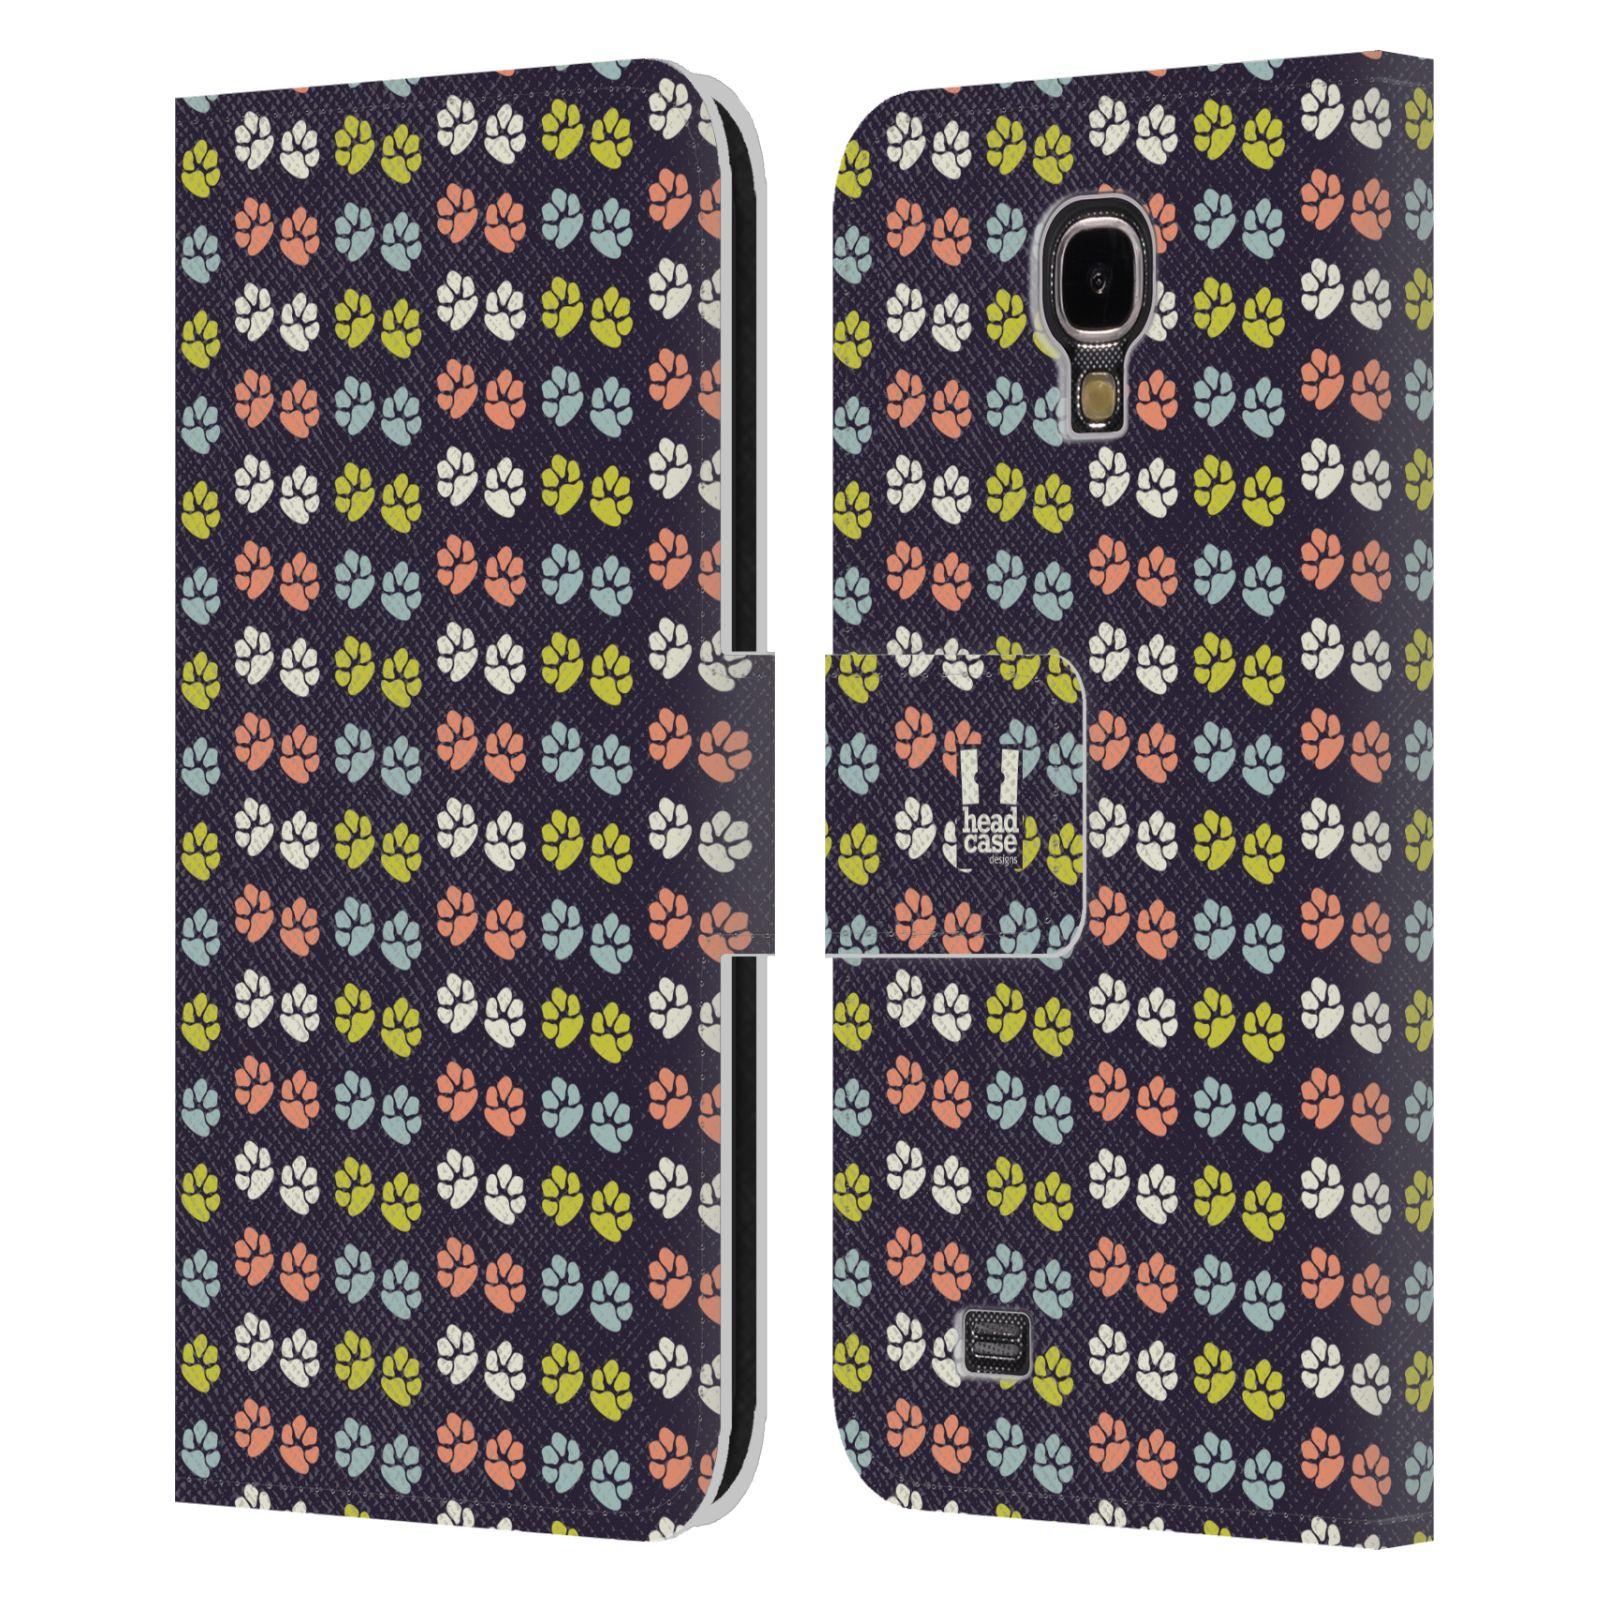 HEAD CASE Flipové pouzdro pro mobil Samsung Galaxy S4 Pejsek ťapky barevné RETRO